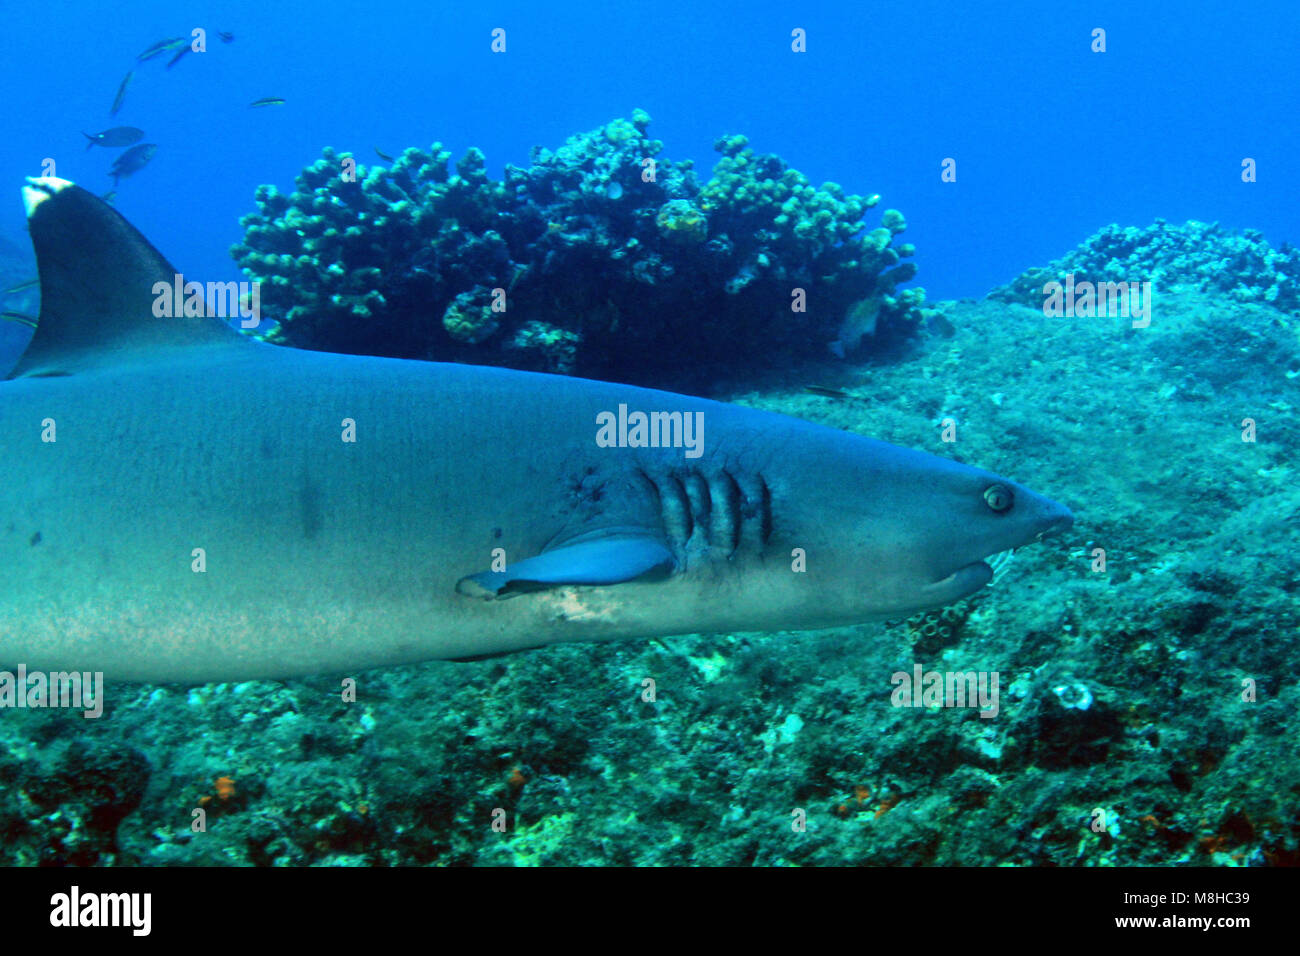 Whitetip Reef Shark (Triaenodon obesus) Swimming over Reef. Coiba, Panama - Stock Image